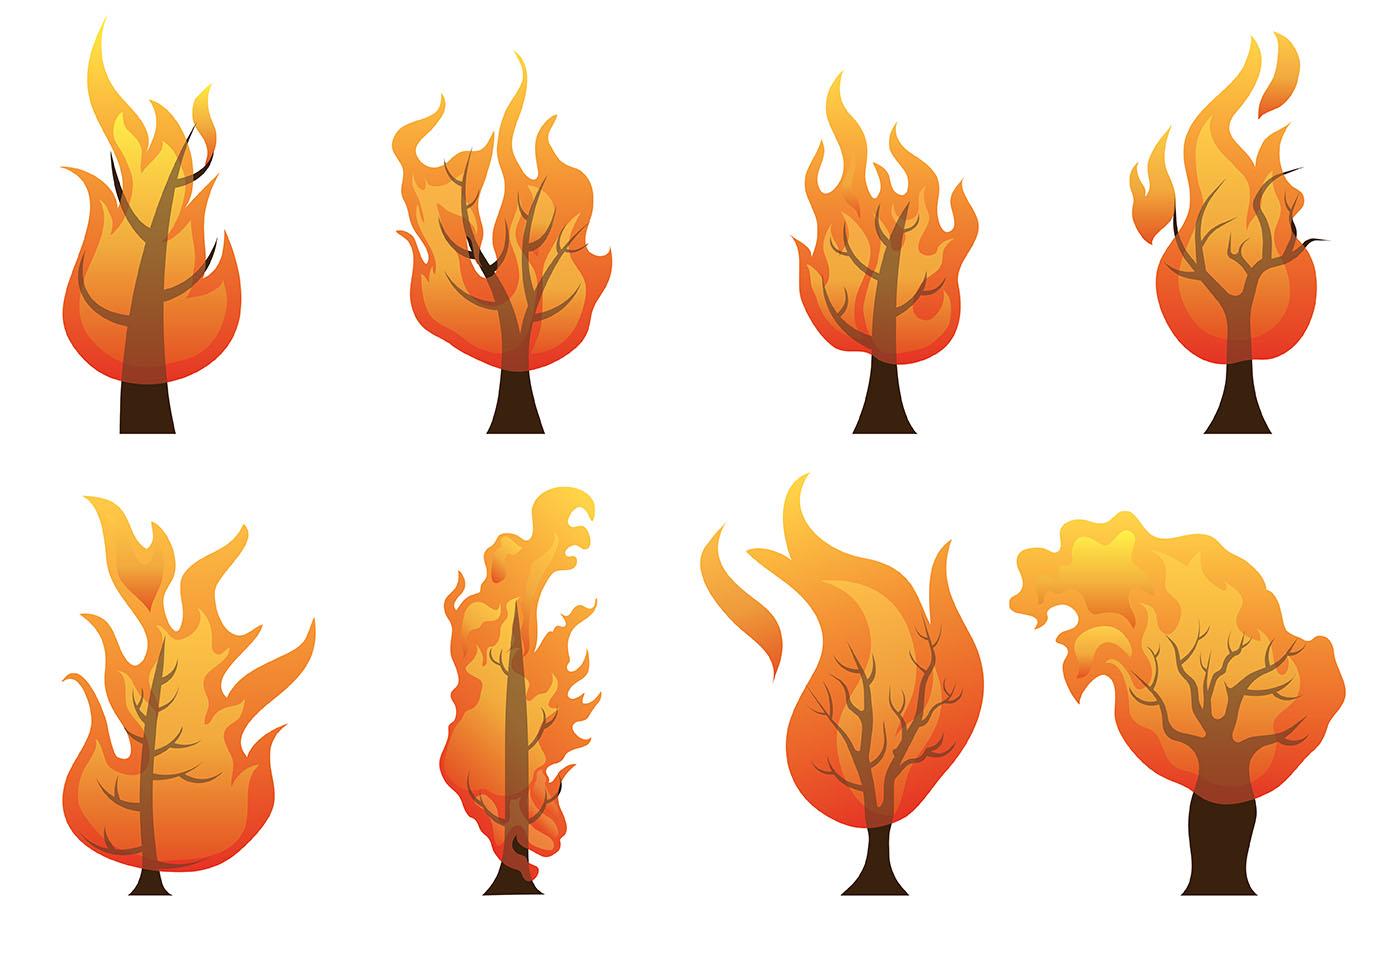 Burning bush clipart 5 » Clipart Station.